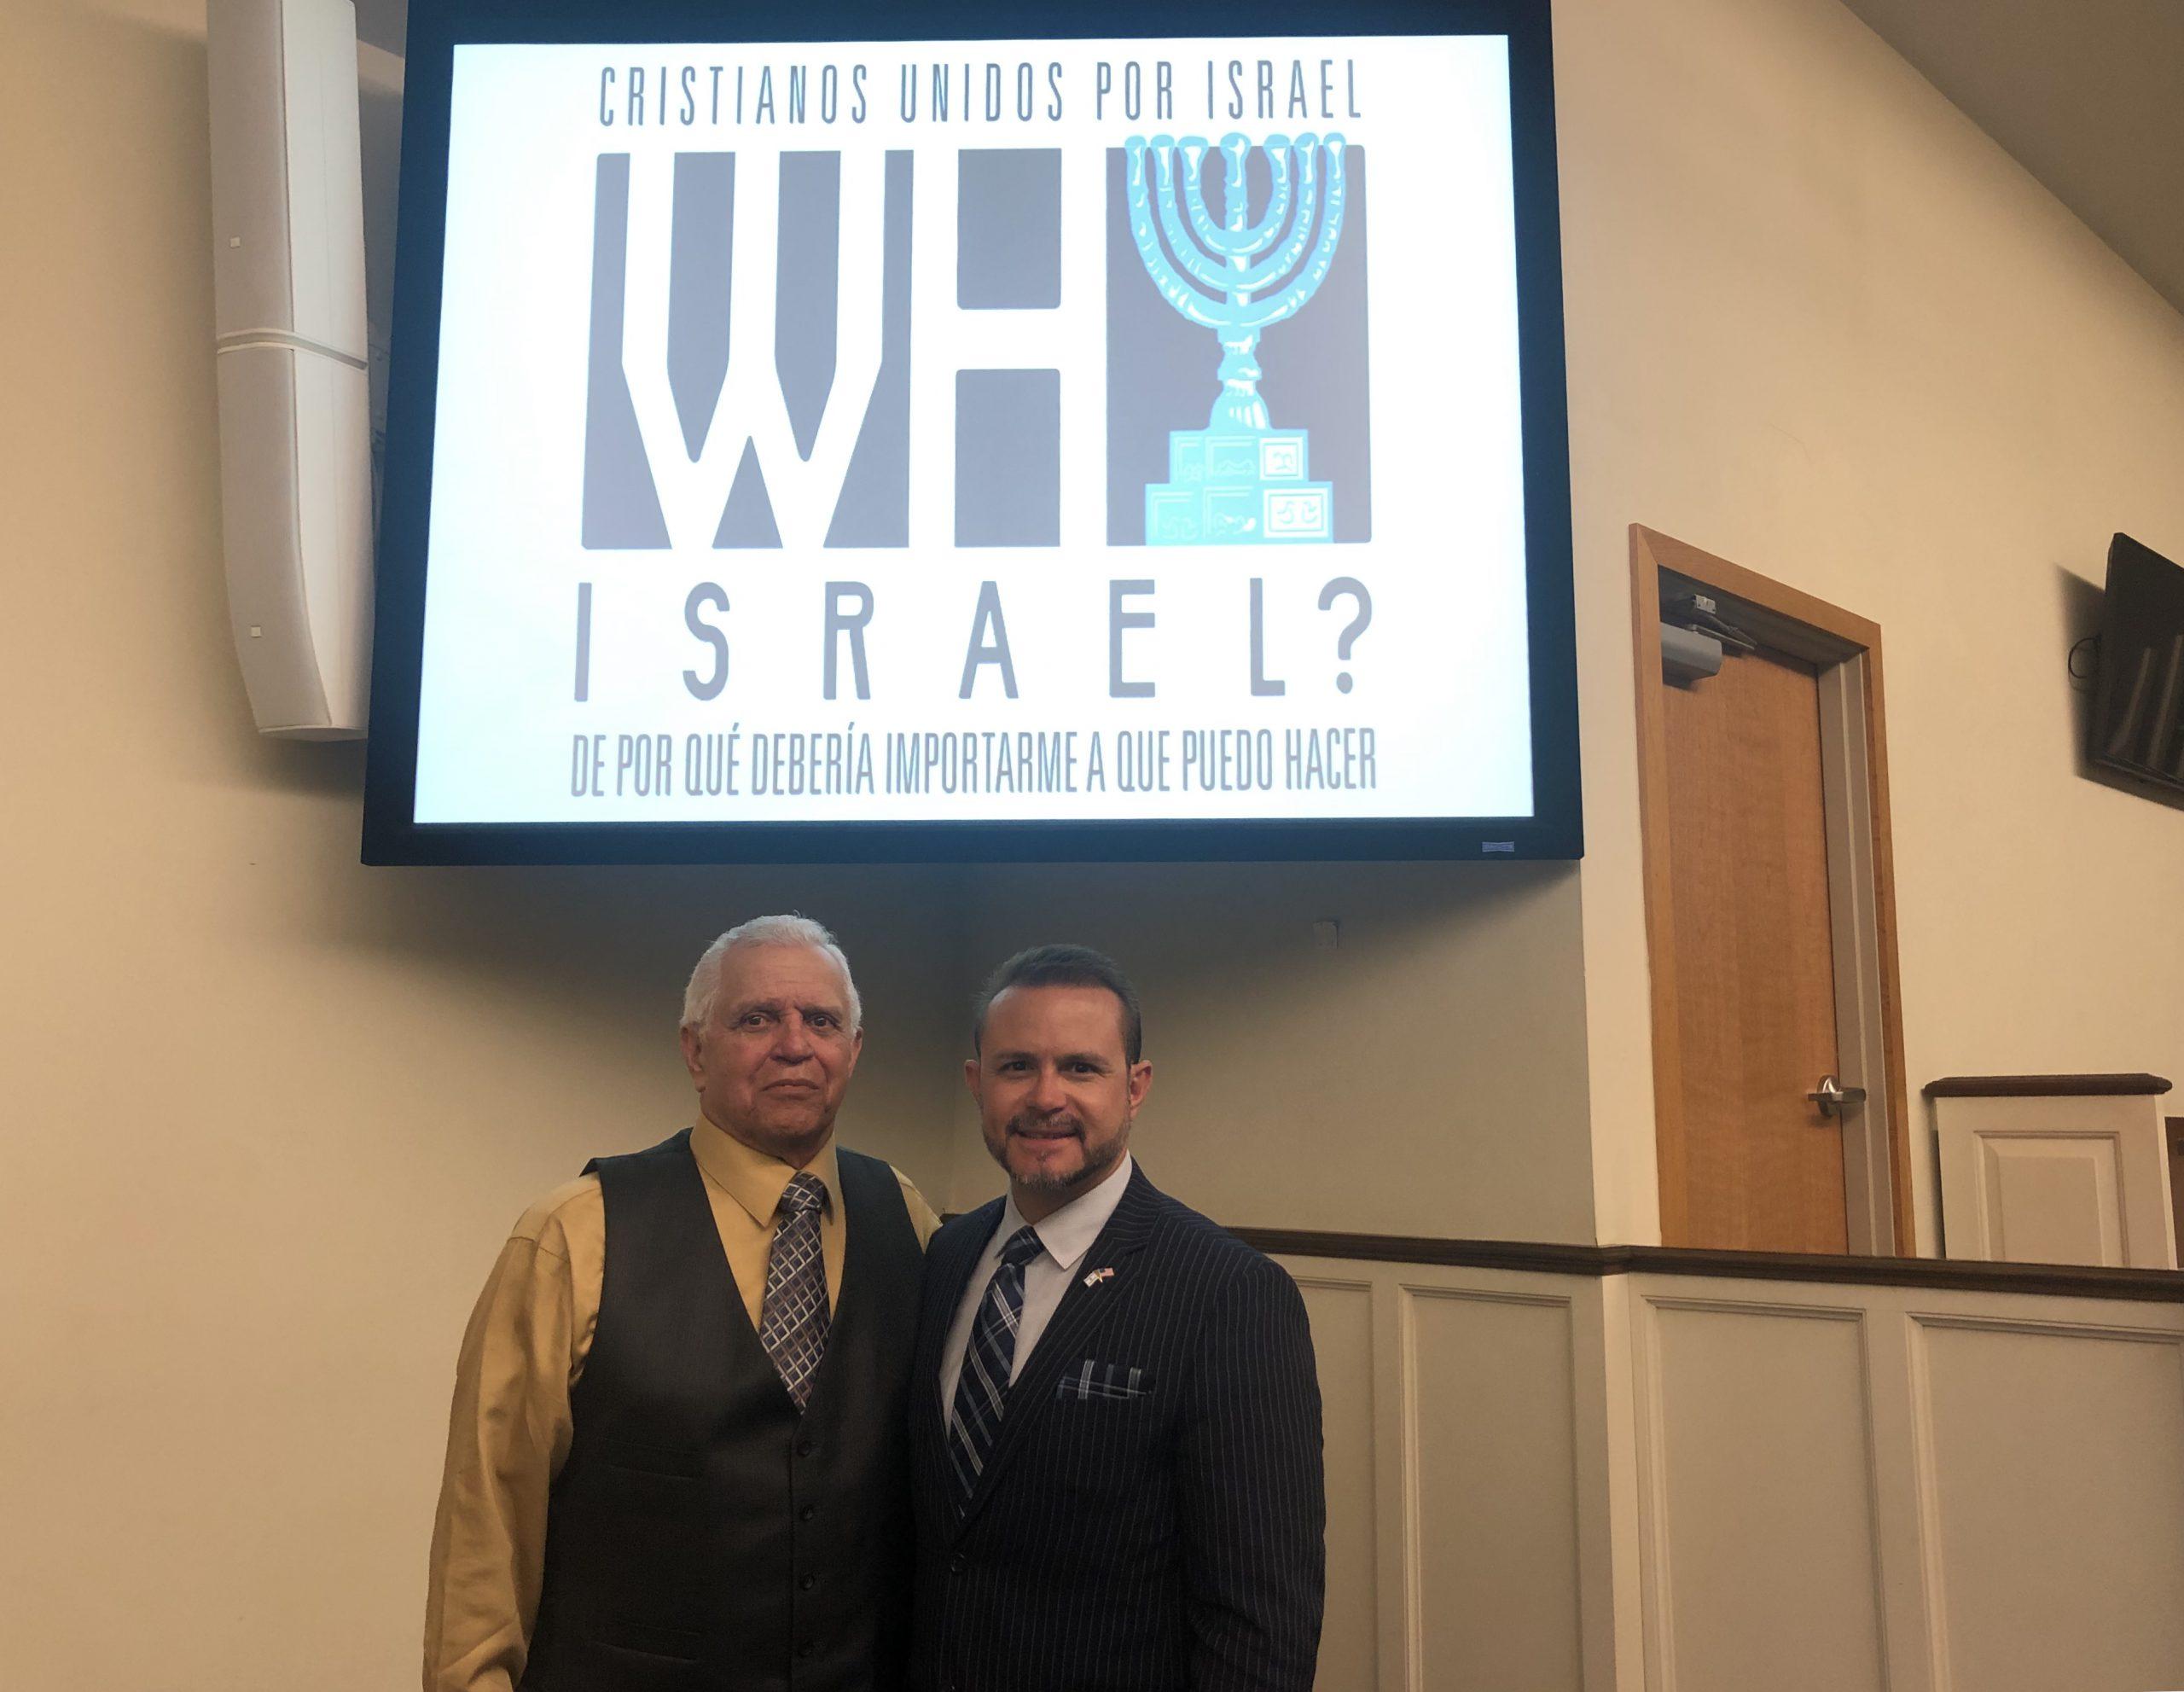 April 6 - Chambersburg, PA - Spanish Why Israel